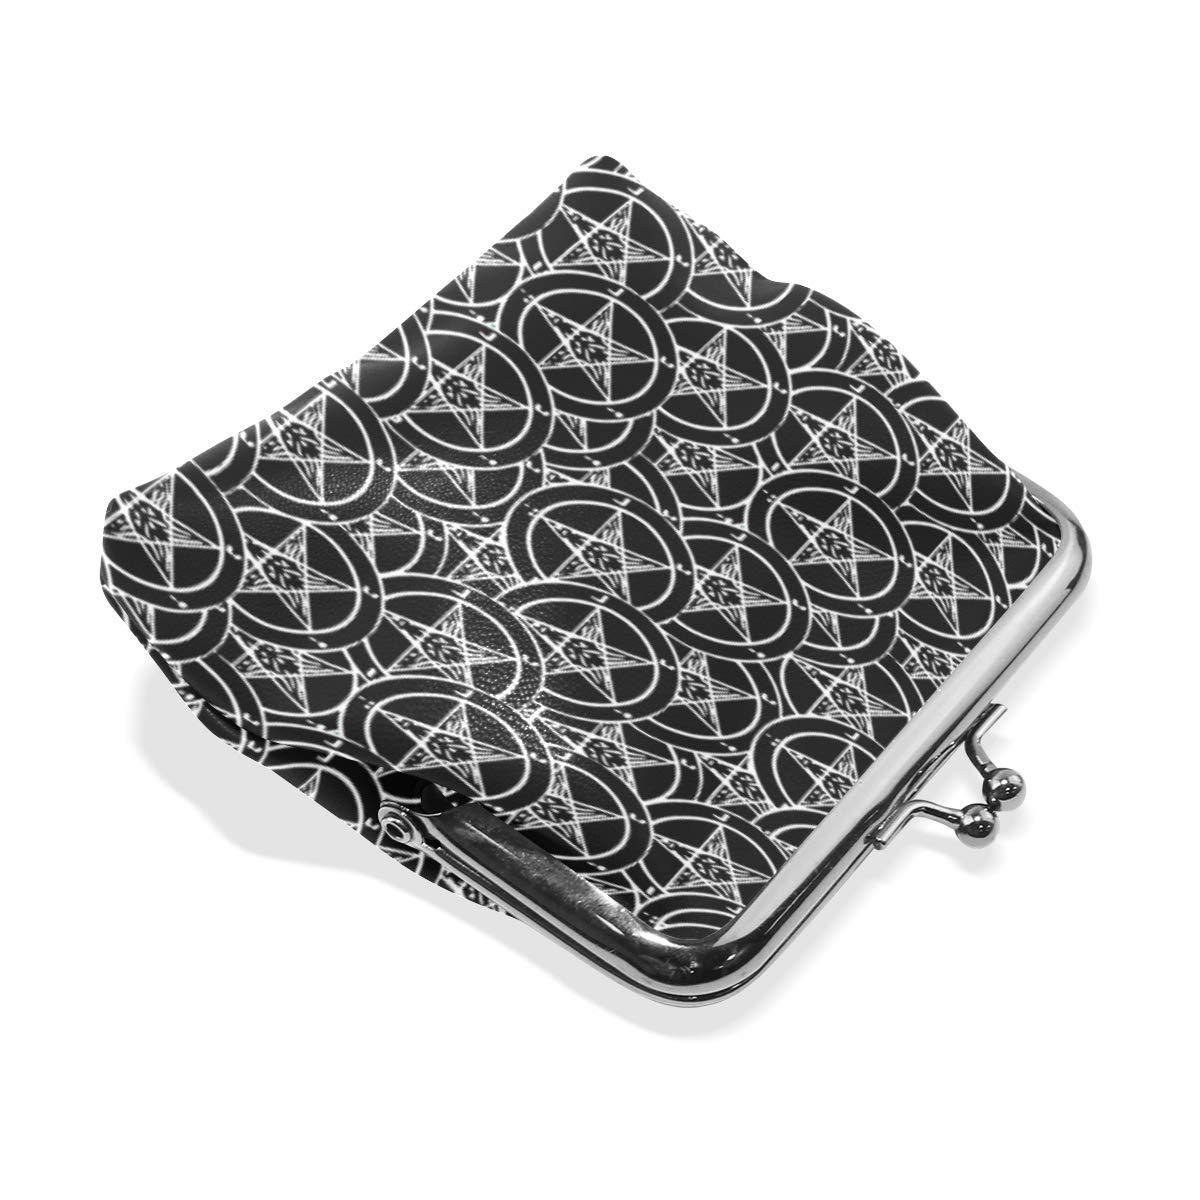 Satanic Sigil Baphomet Pentagram Coin Purse Buckle Vintage PU Pouch Kiss-lock Wallet for Women Girl